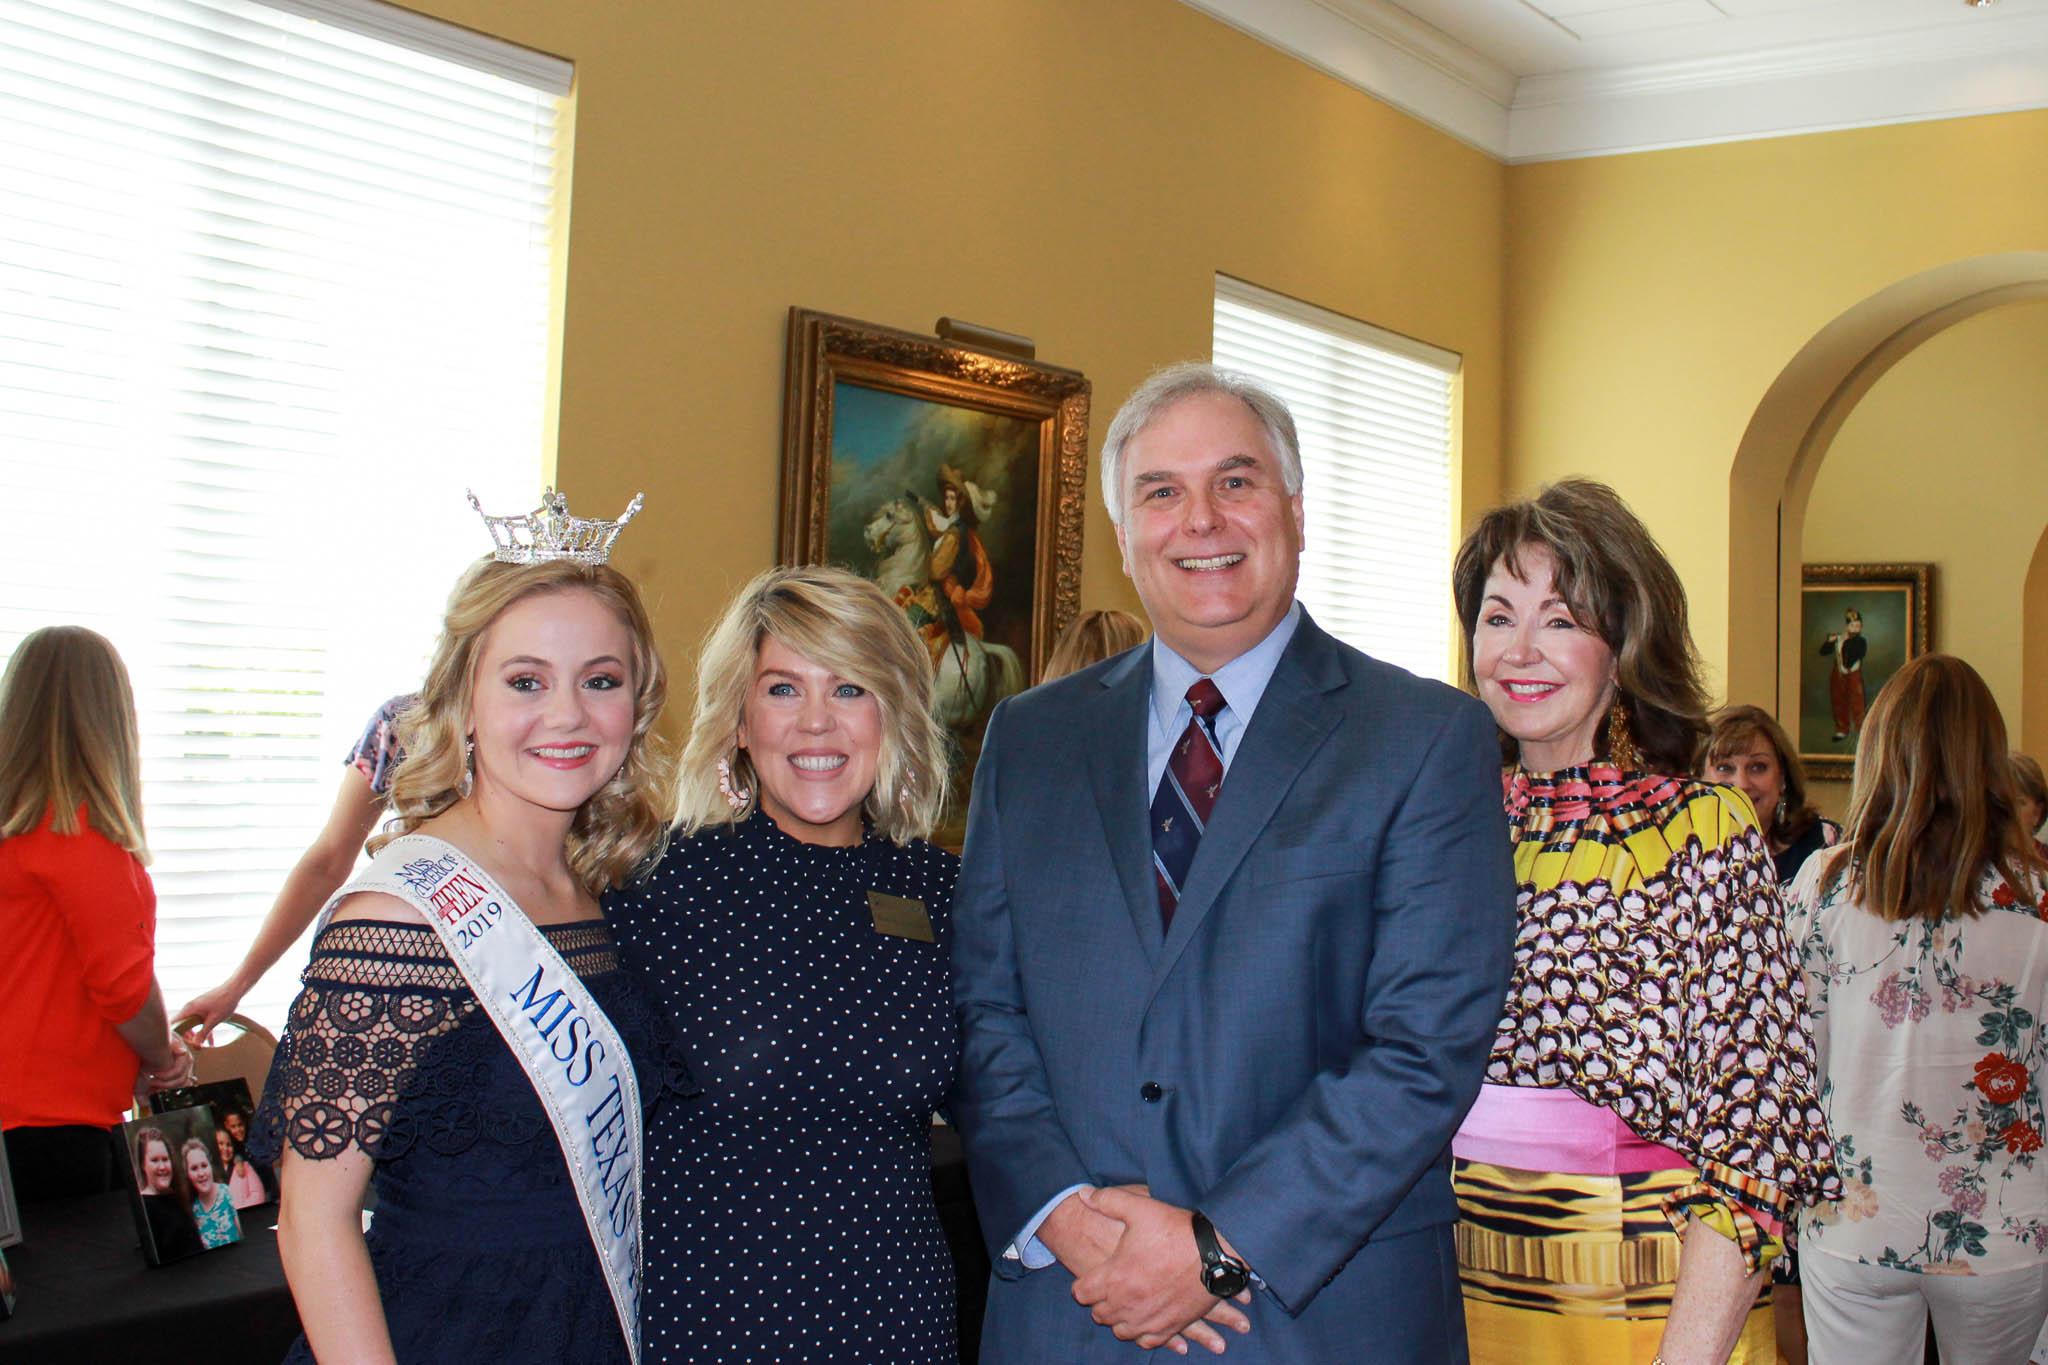 Allie Graves, Brandy Eldridge, Judge Jeff Addison and Judy Morgan